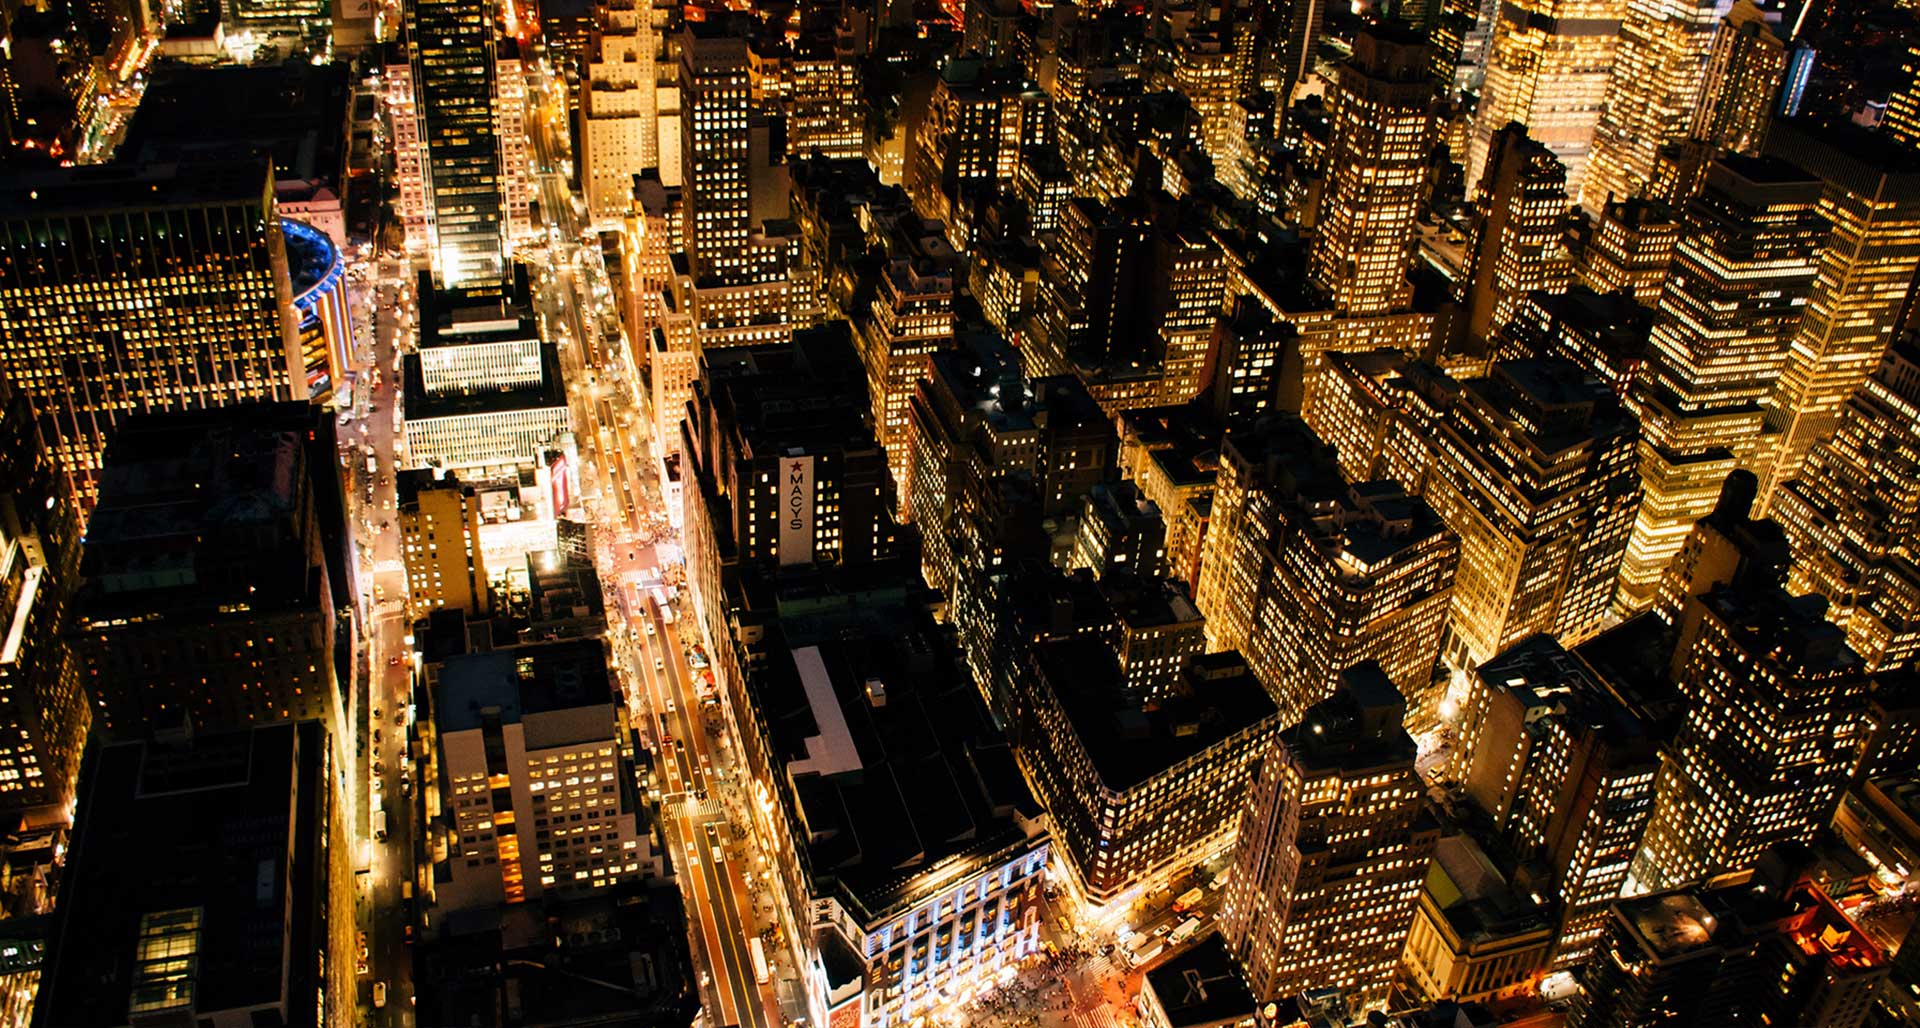 Hotels near Bryant Park | NYC Hotels | The Americana Inn